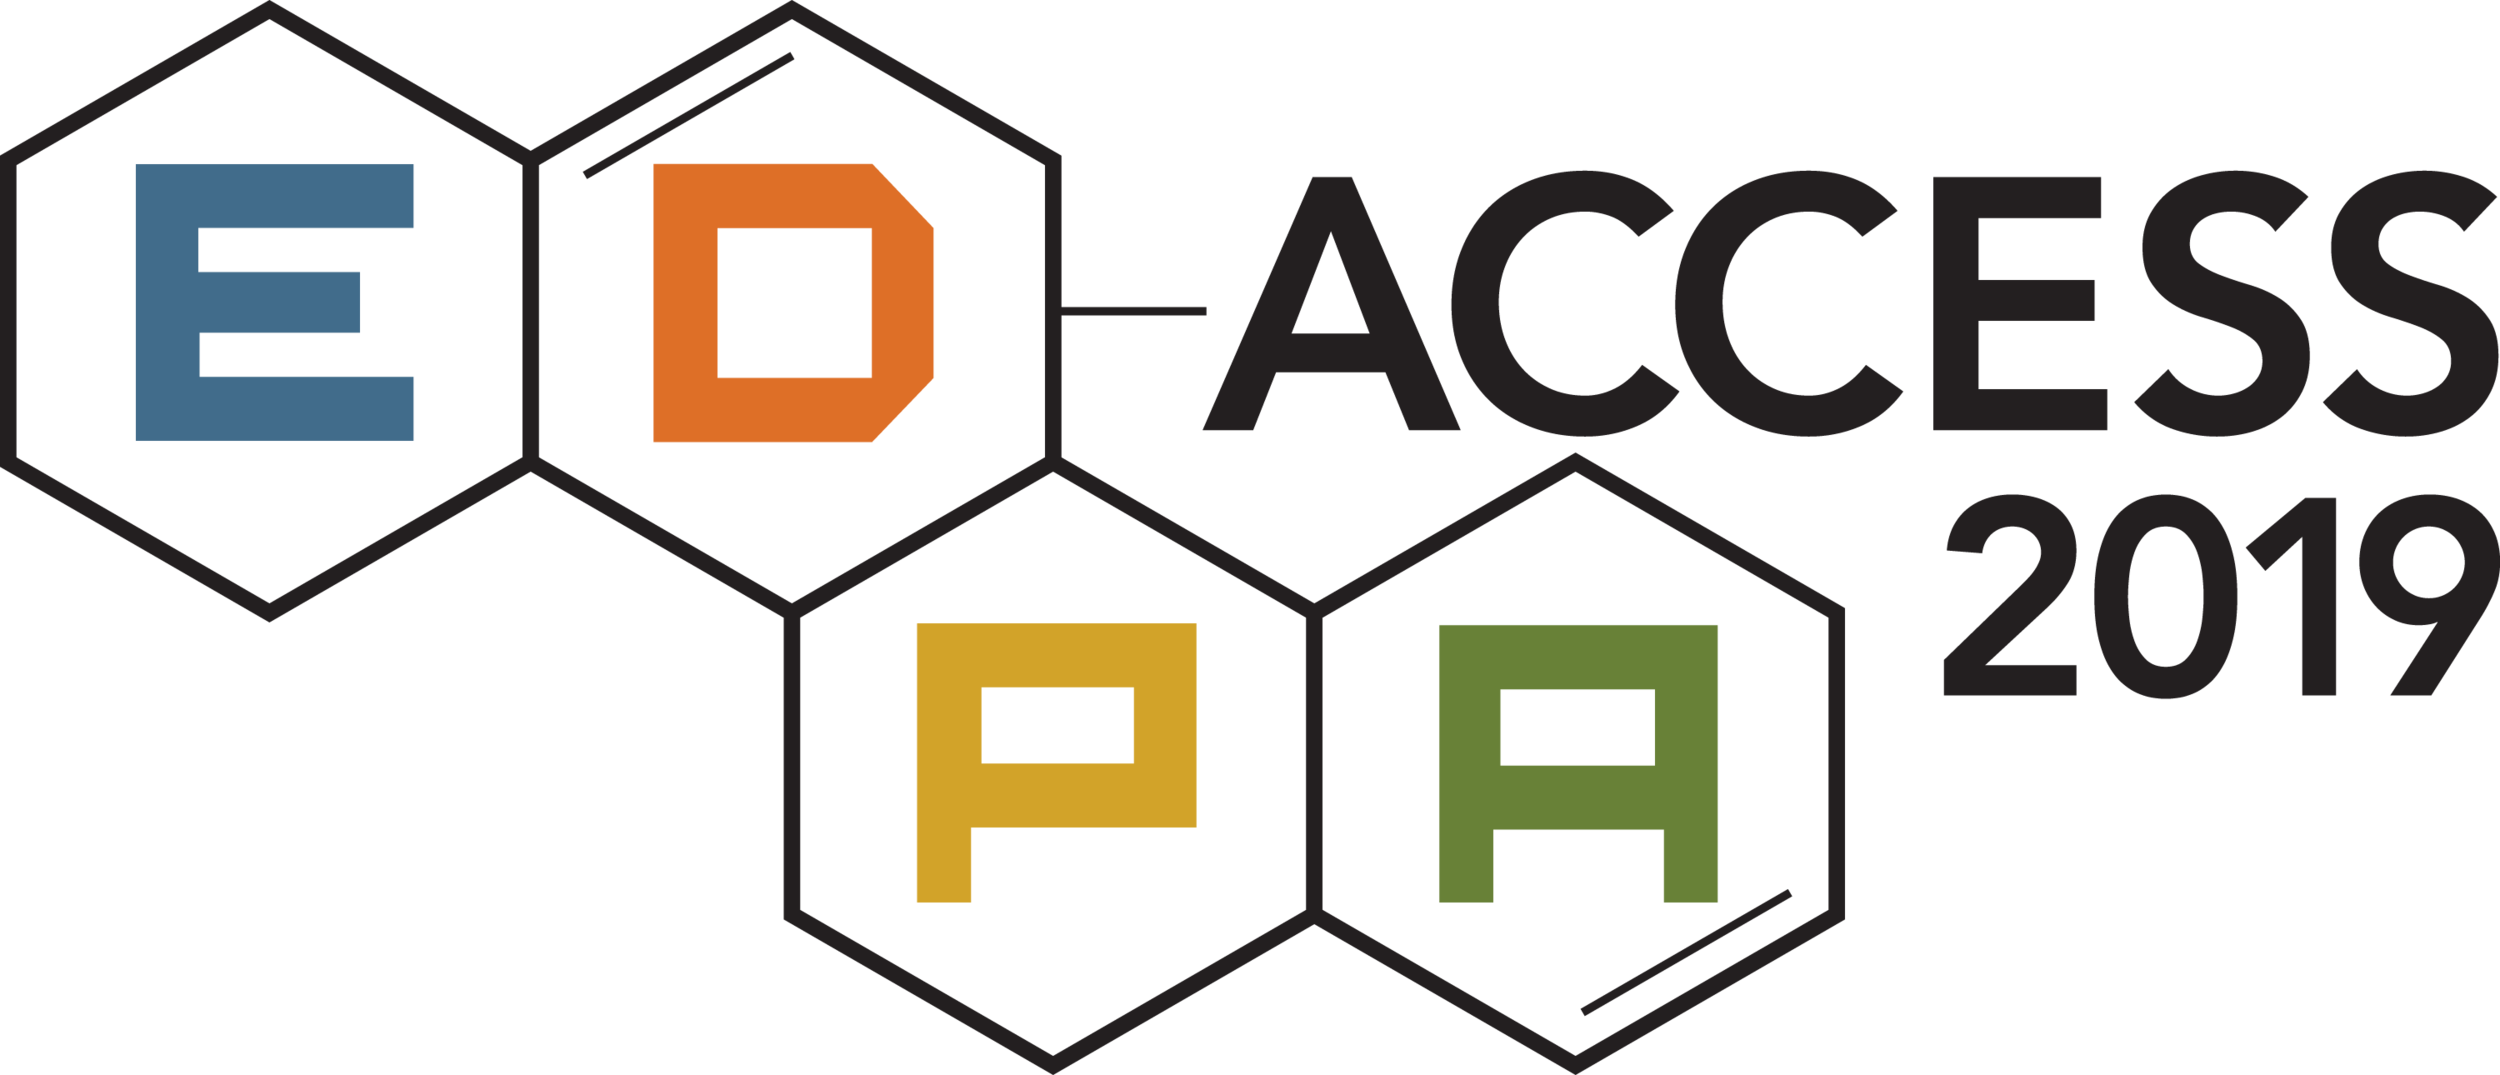 EDPA_Access2019_Logo_HiRes.png